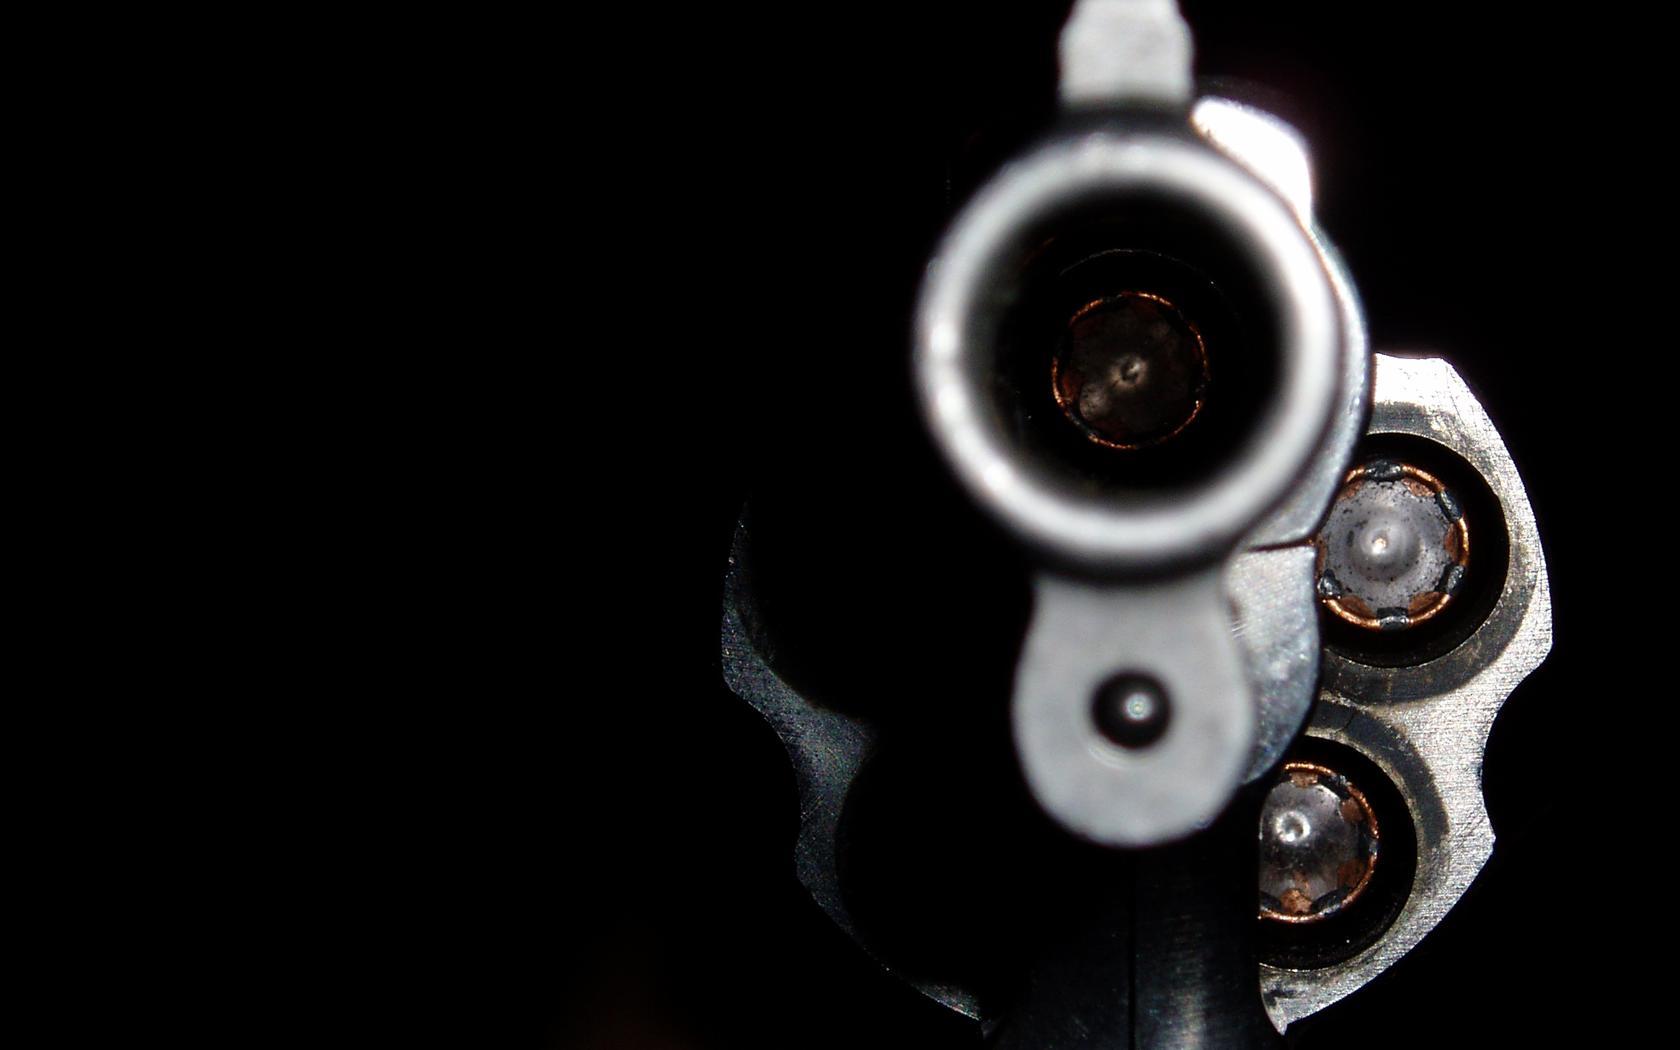 3 Christian Teachers Murdered by Al-Shabaab Extremists in Raid on Primary School in Kenya